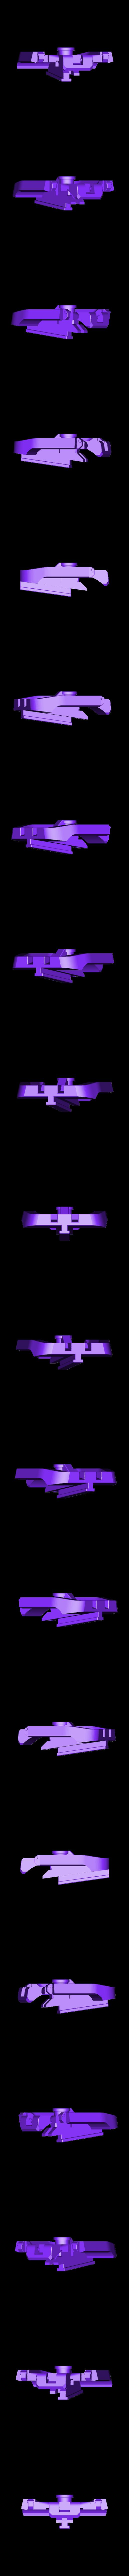 29_Drag_Waist2_Top_GREEN.stl Download STL file ARTICULATED DRAGONLORD (not Dragonzord) - NO SUPPORT • 3D printer model, Toymakr3D